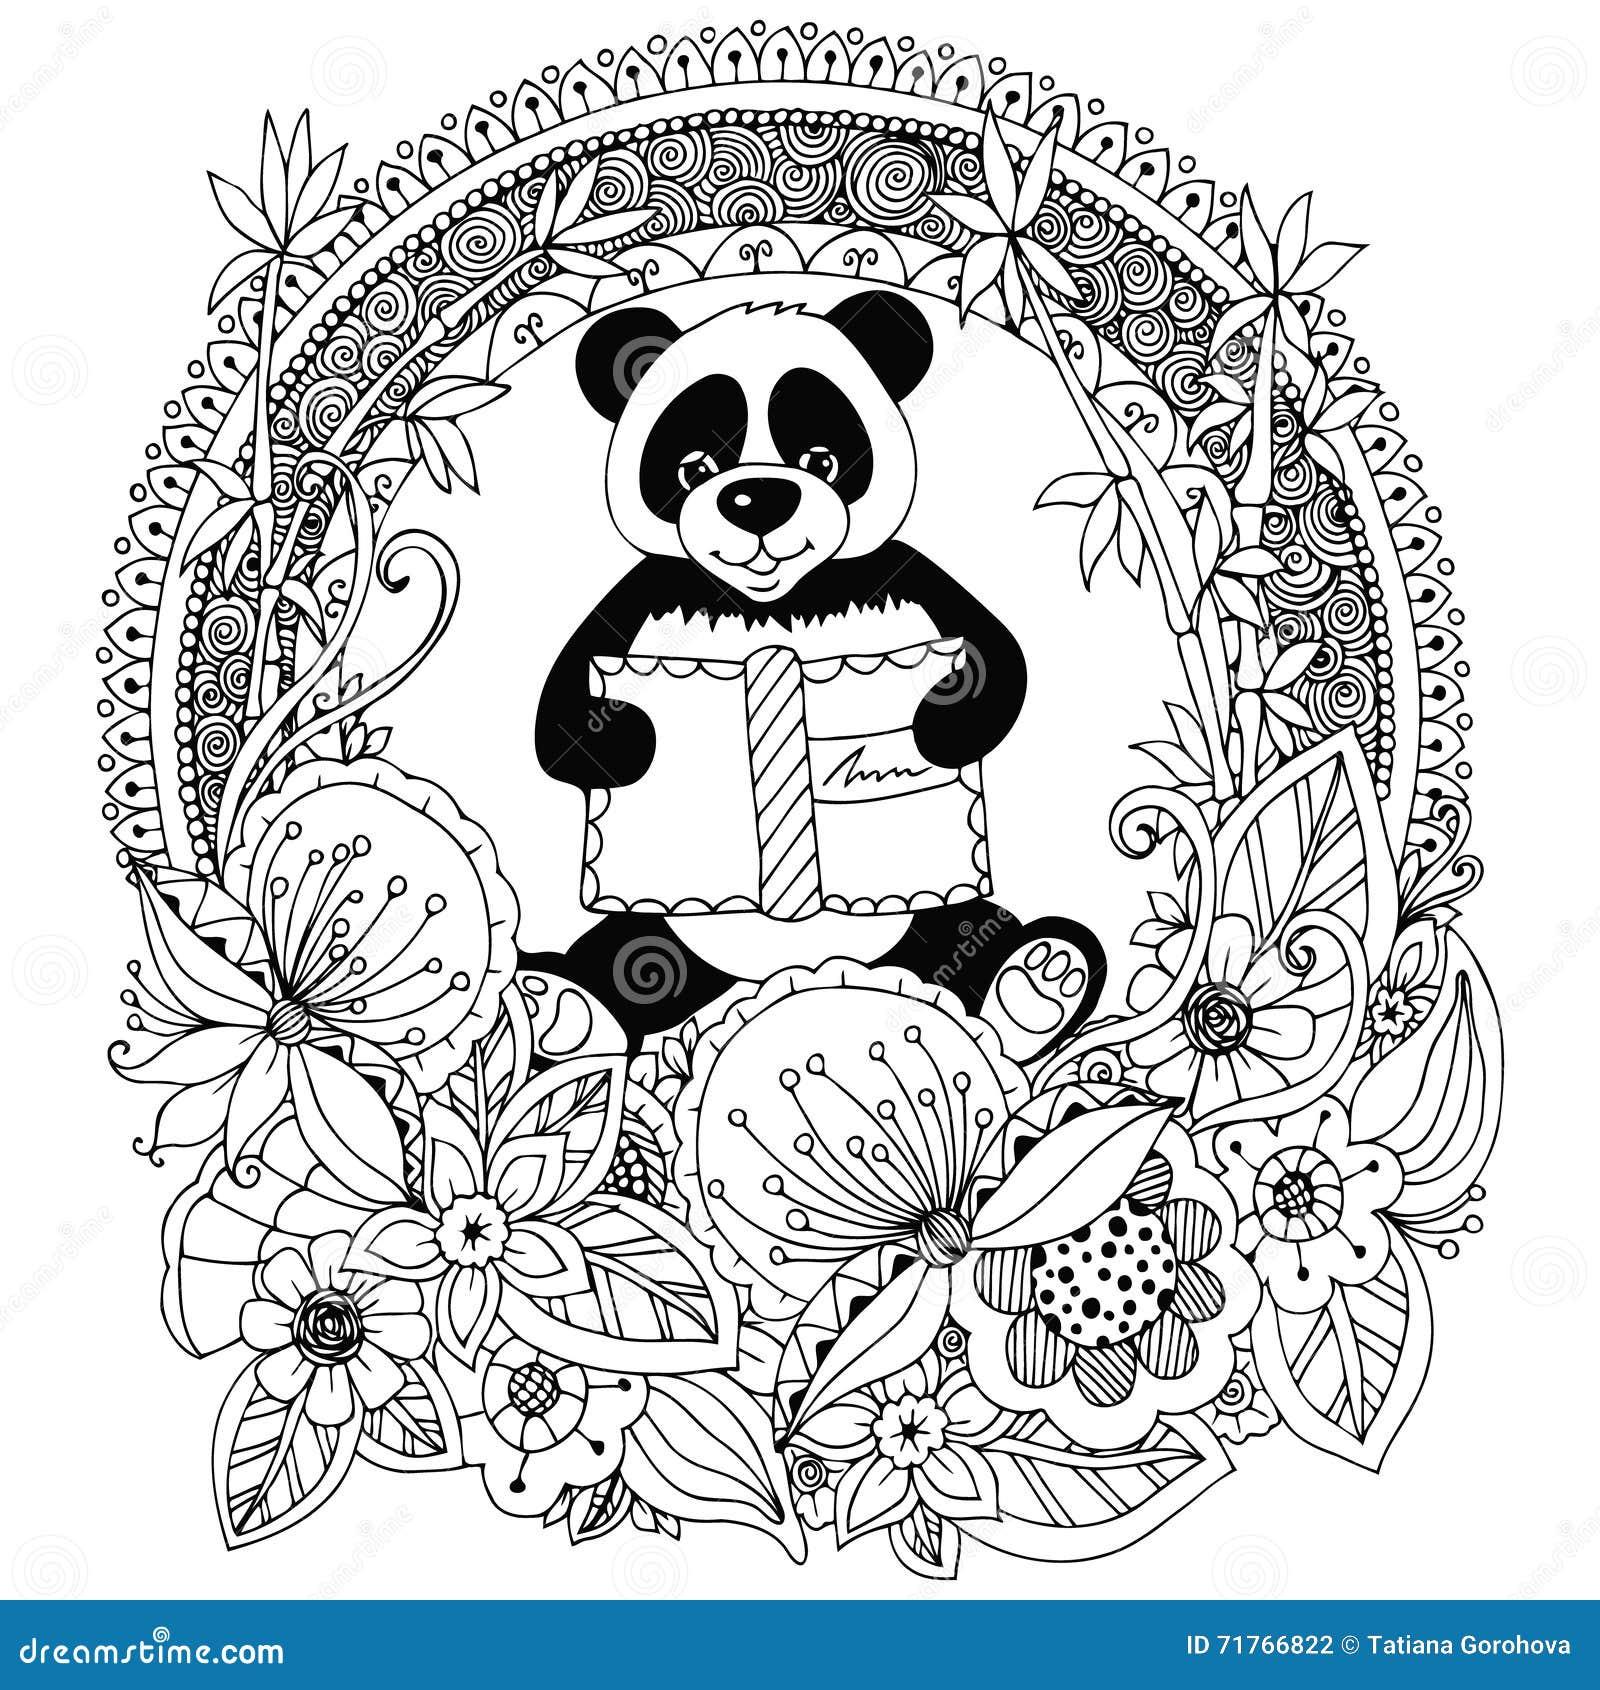 Charming Secret Garden Coloring Book Tall Curious George Coloring Book Shaped Skull Coloring Book Marvel Coloring Books Youthful Pantone Color Books FreshFairy Coloring Book Vector Illustration Zen Tangle Panda With A Book Floral Circle ..